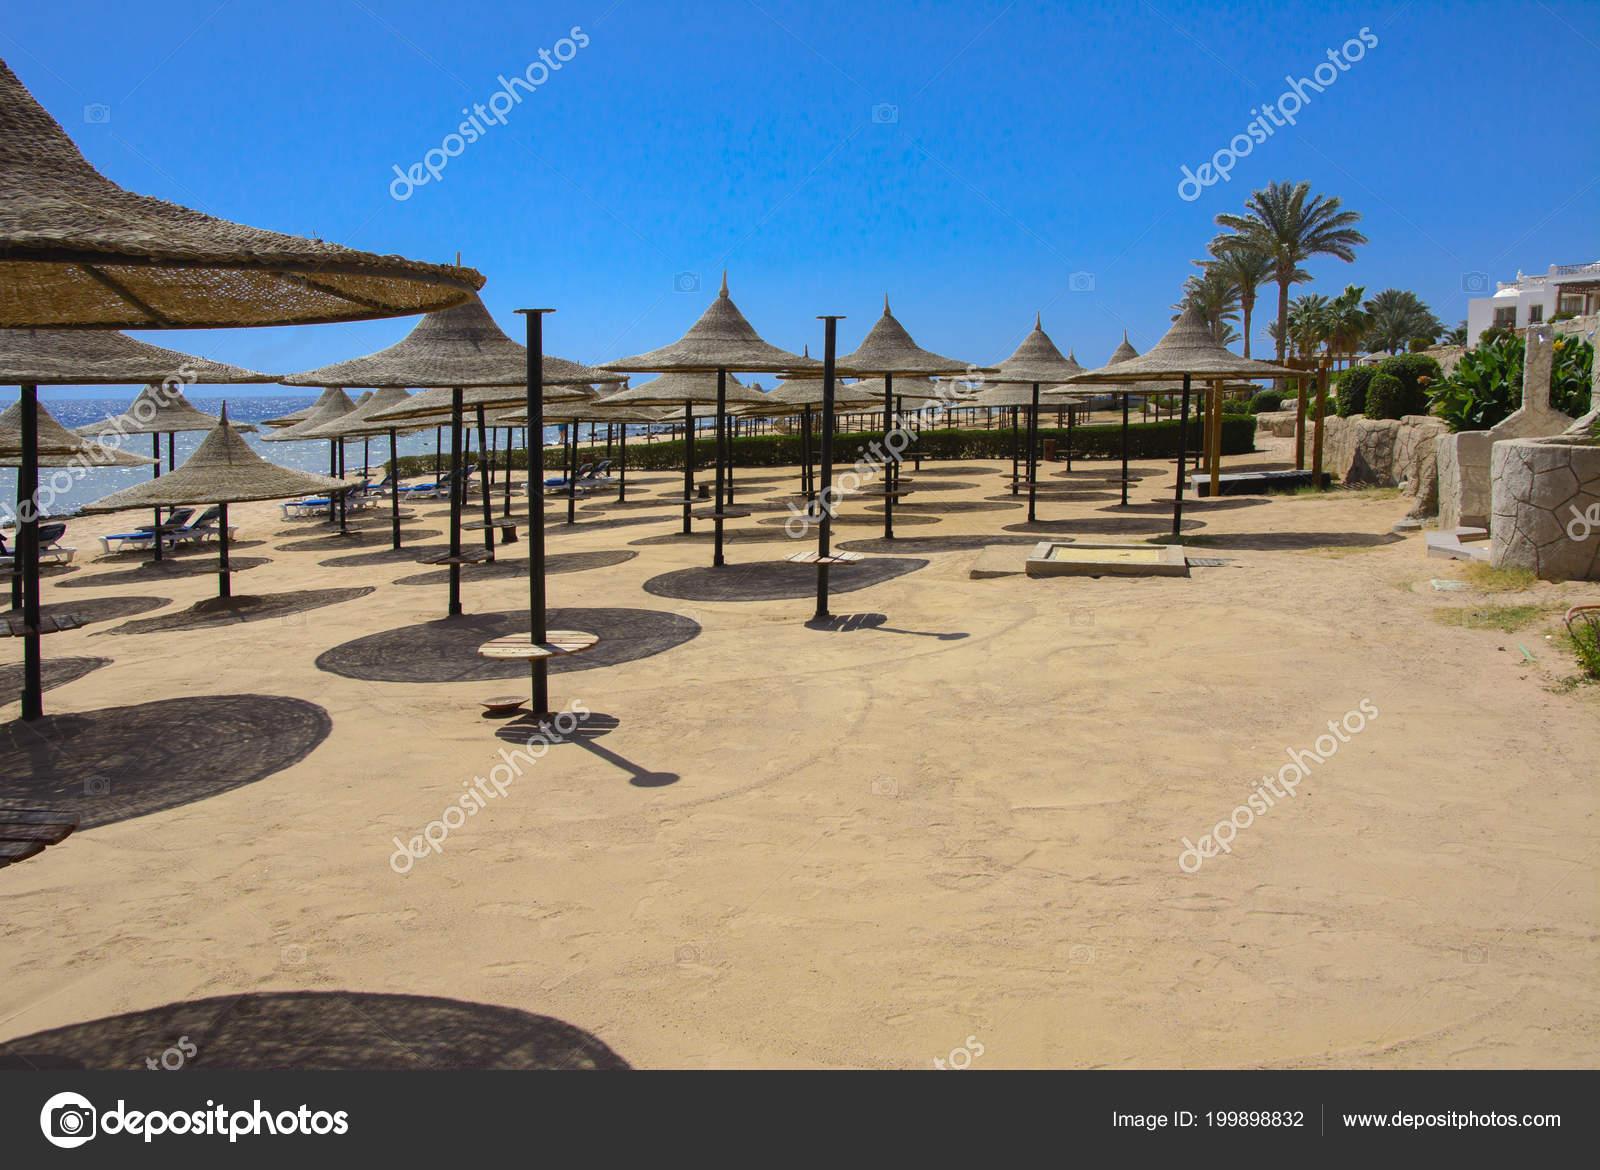 Row Straw Umbrellas Protect Overheating Sunbeds Sandy Beach